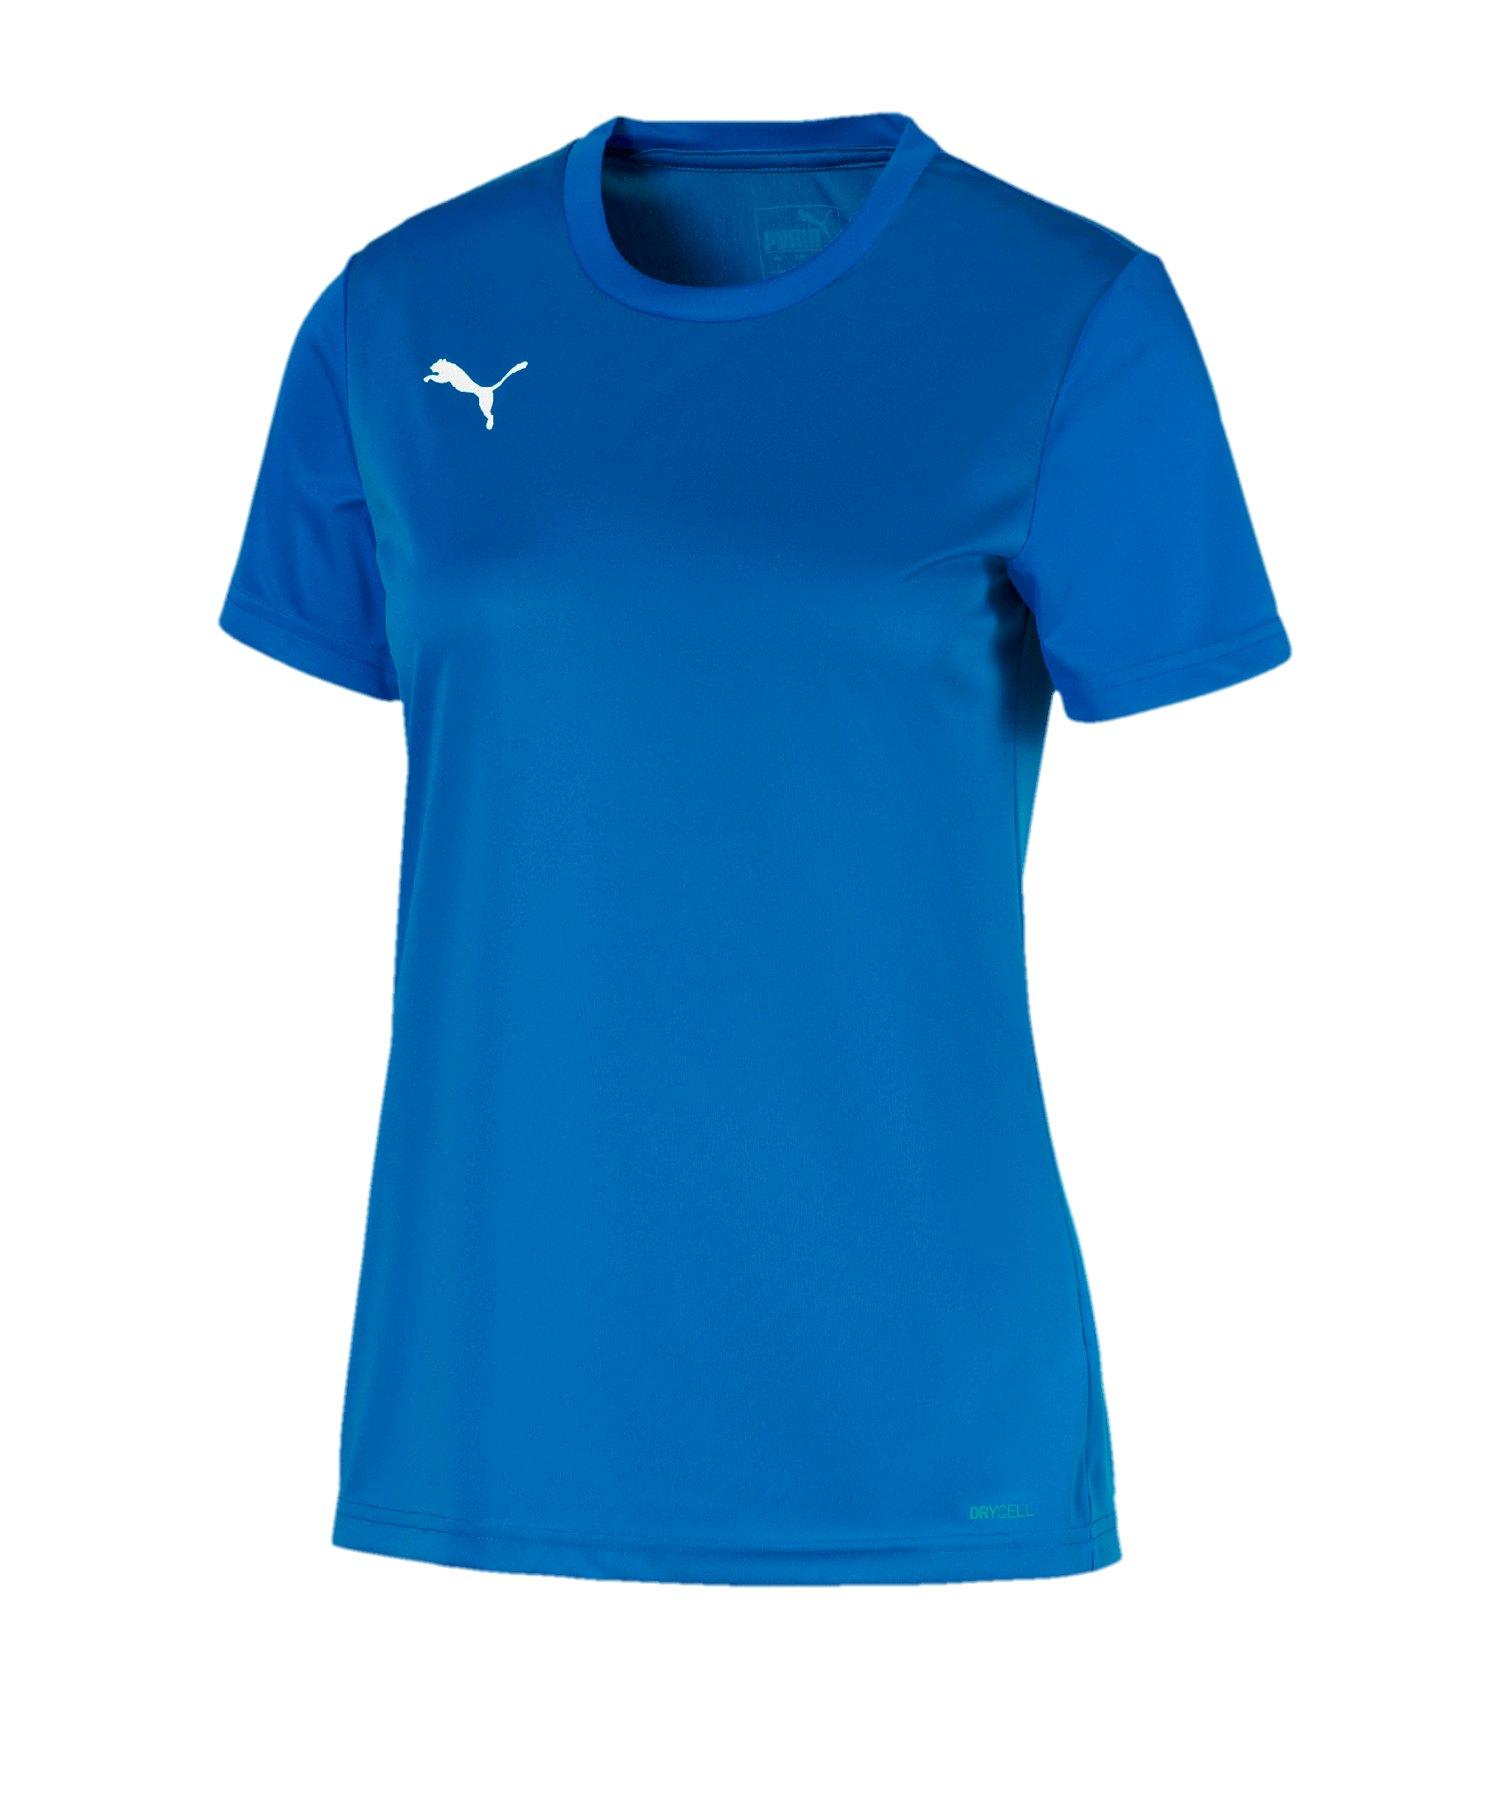 PUMA teamGOAL 23 Sideline Tee T-Shirt Damen F02 - blau